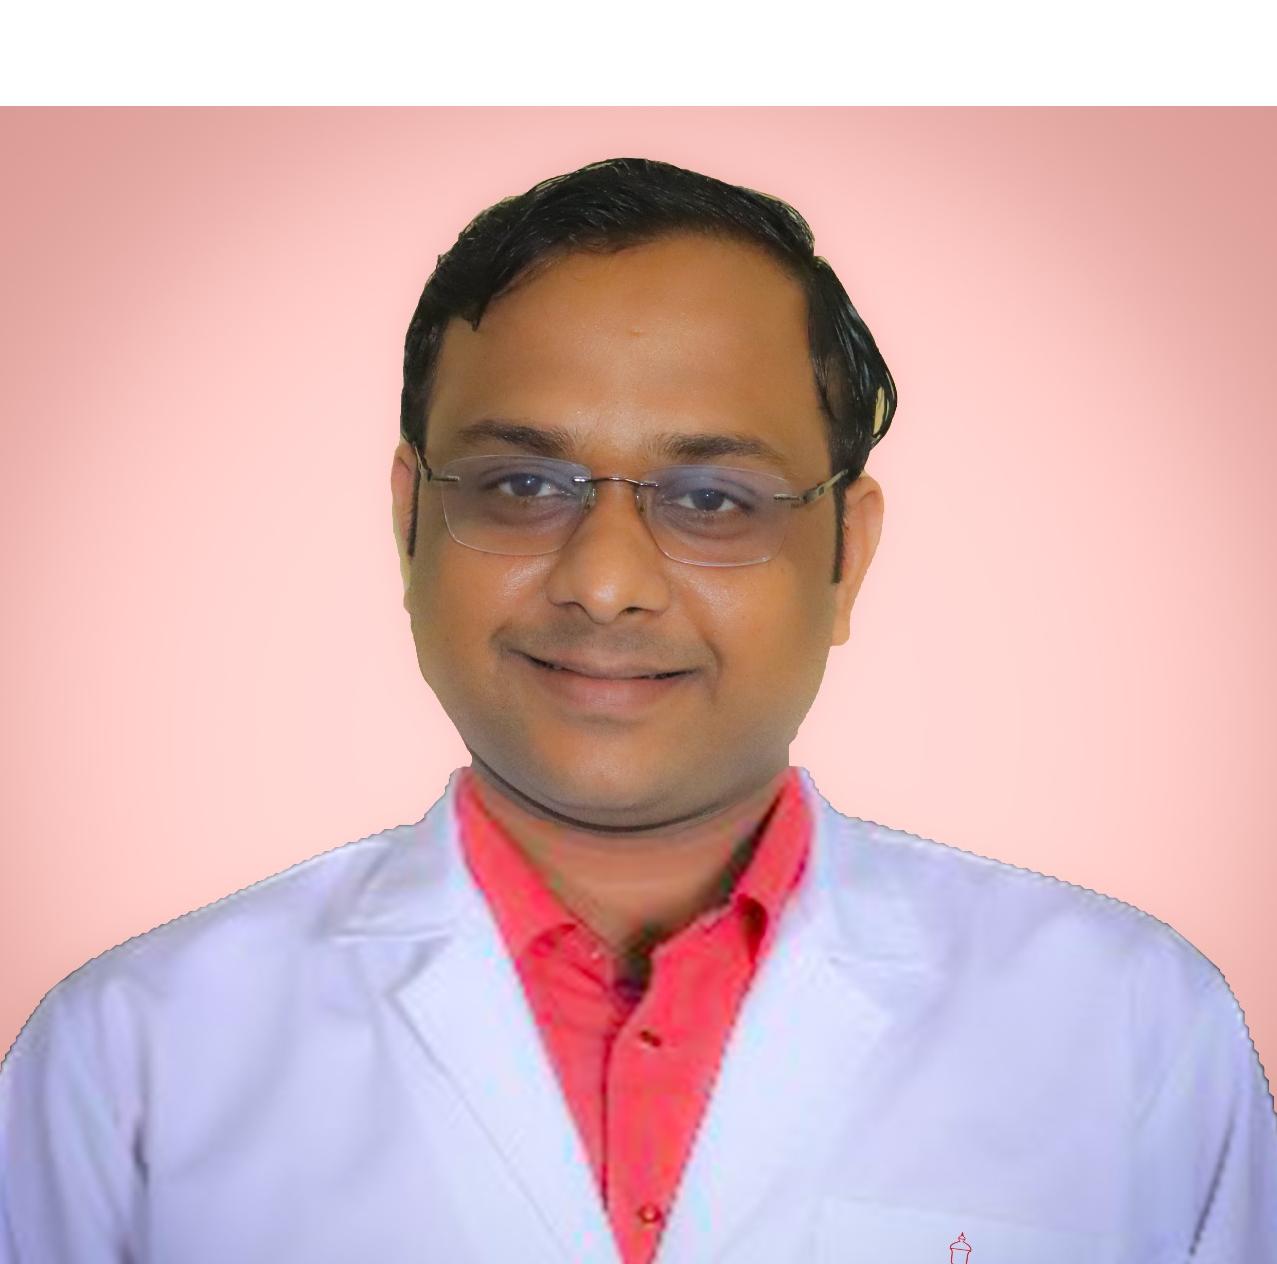 TEAM NOON HOSPITAL WELCOMES DR. KANAK GUPTA